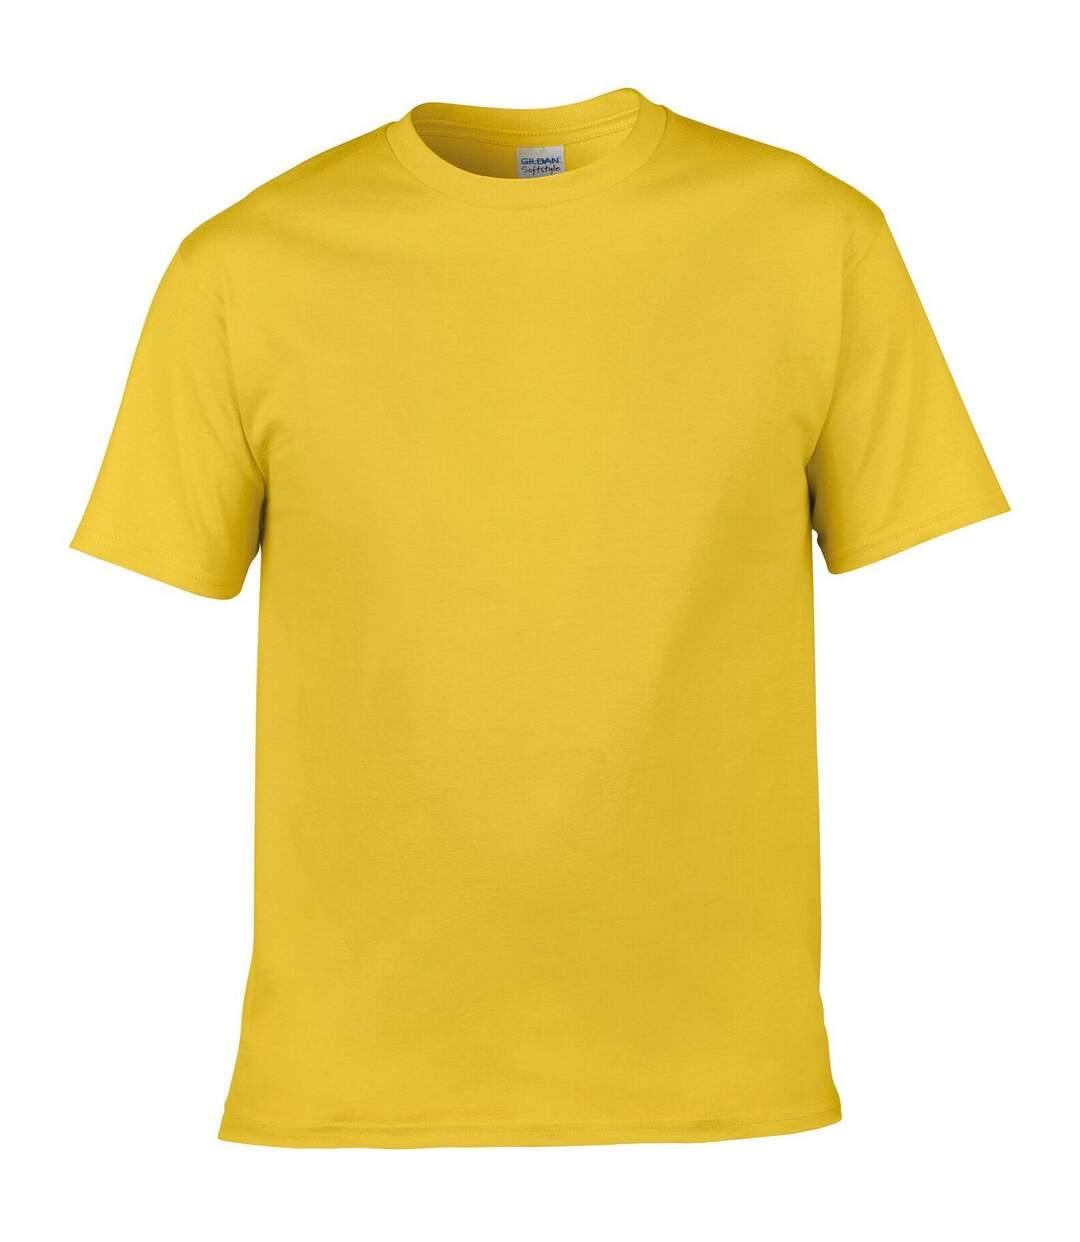 Gildan Mens Soft Style Ringspun T Shirt (Heather Indigo) - UTPC2882